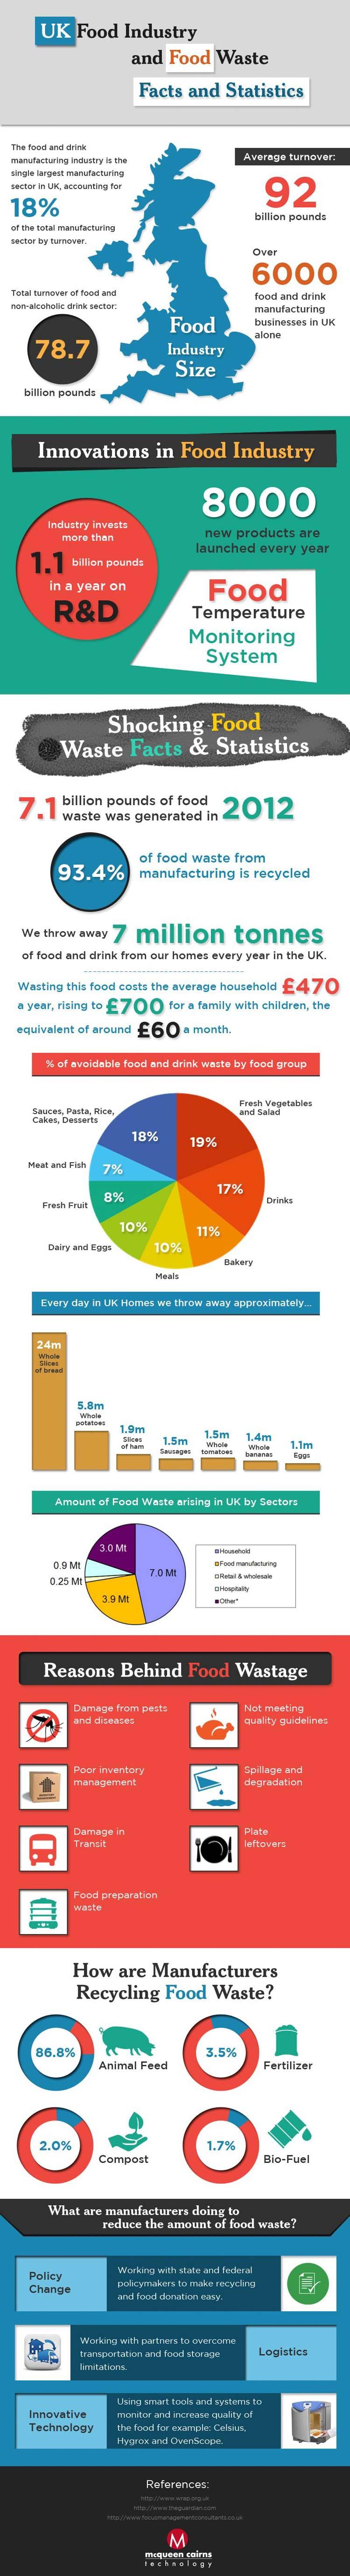 2_UK food waste infographic